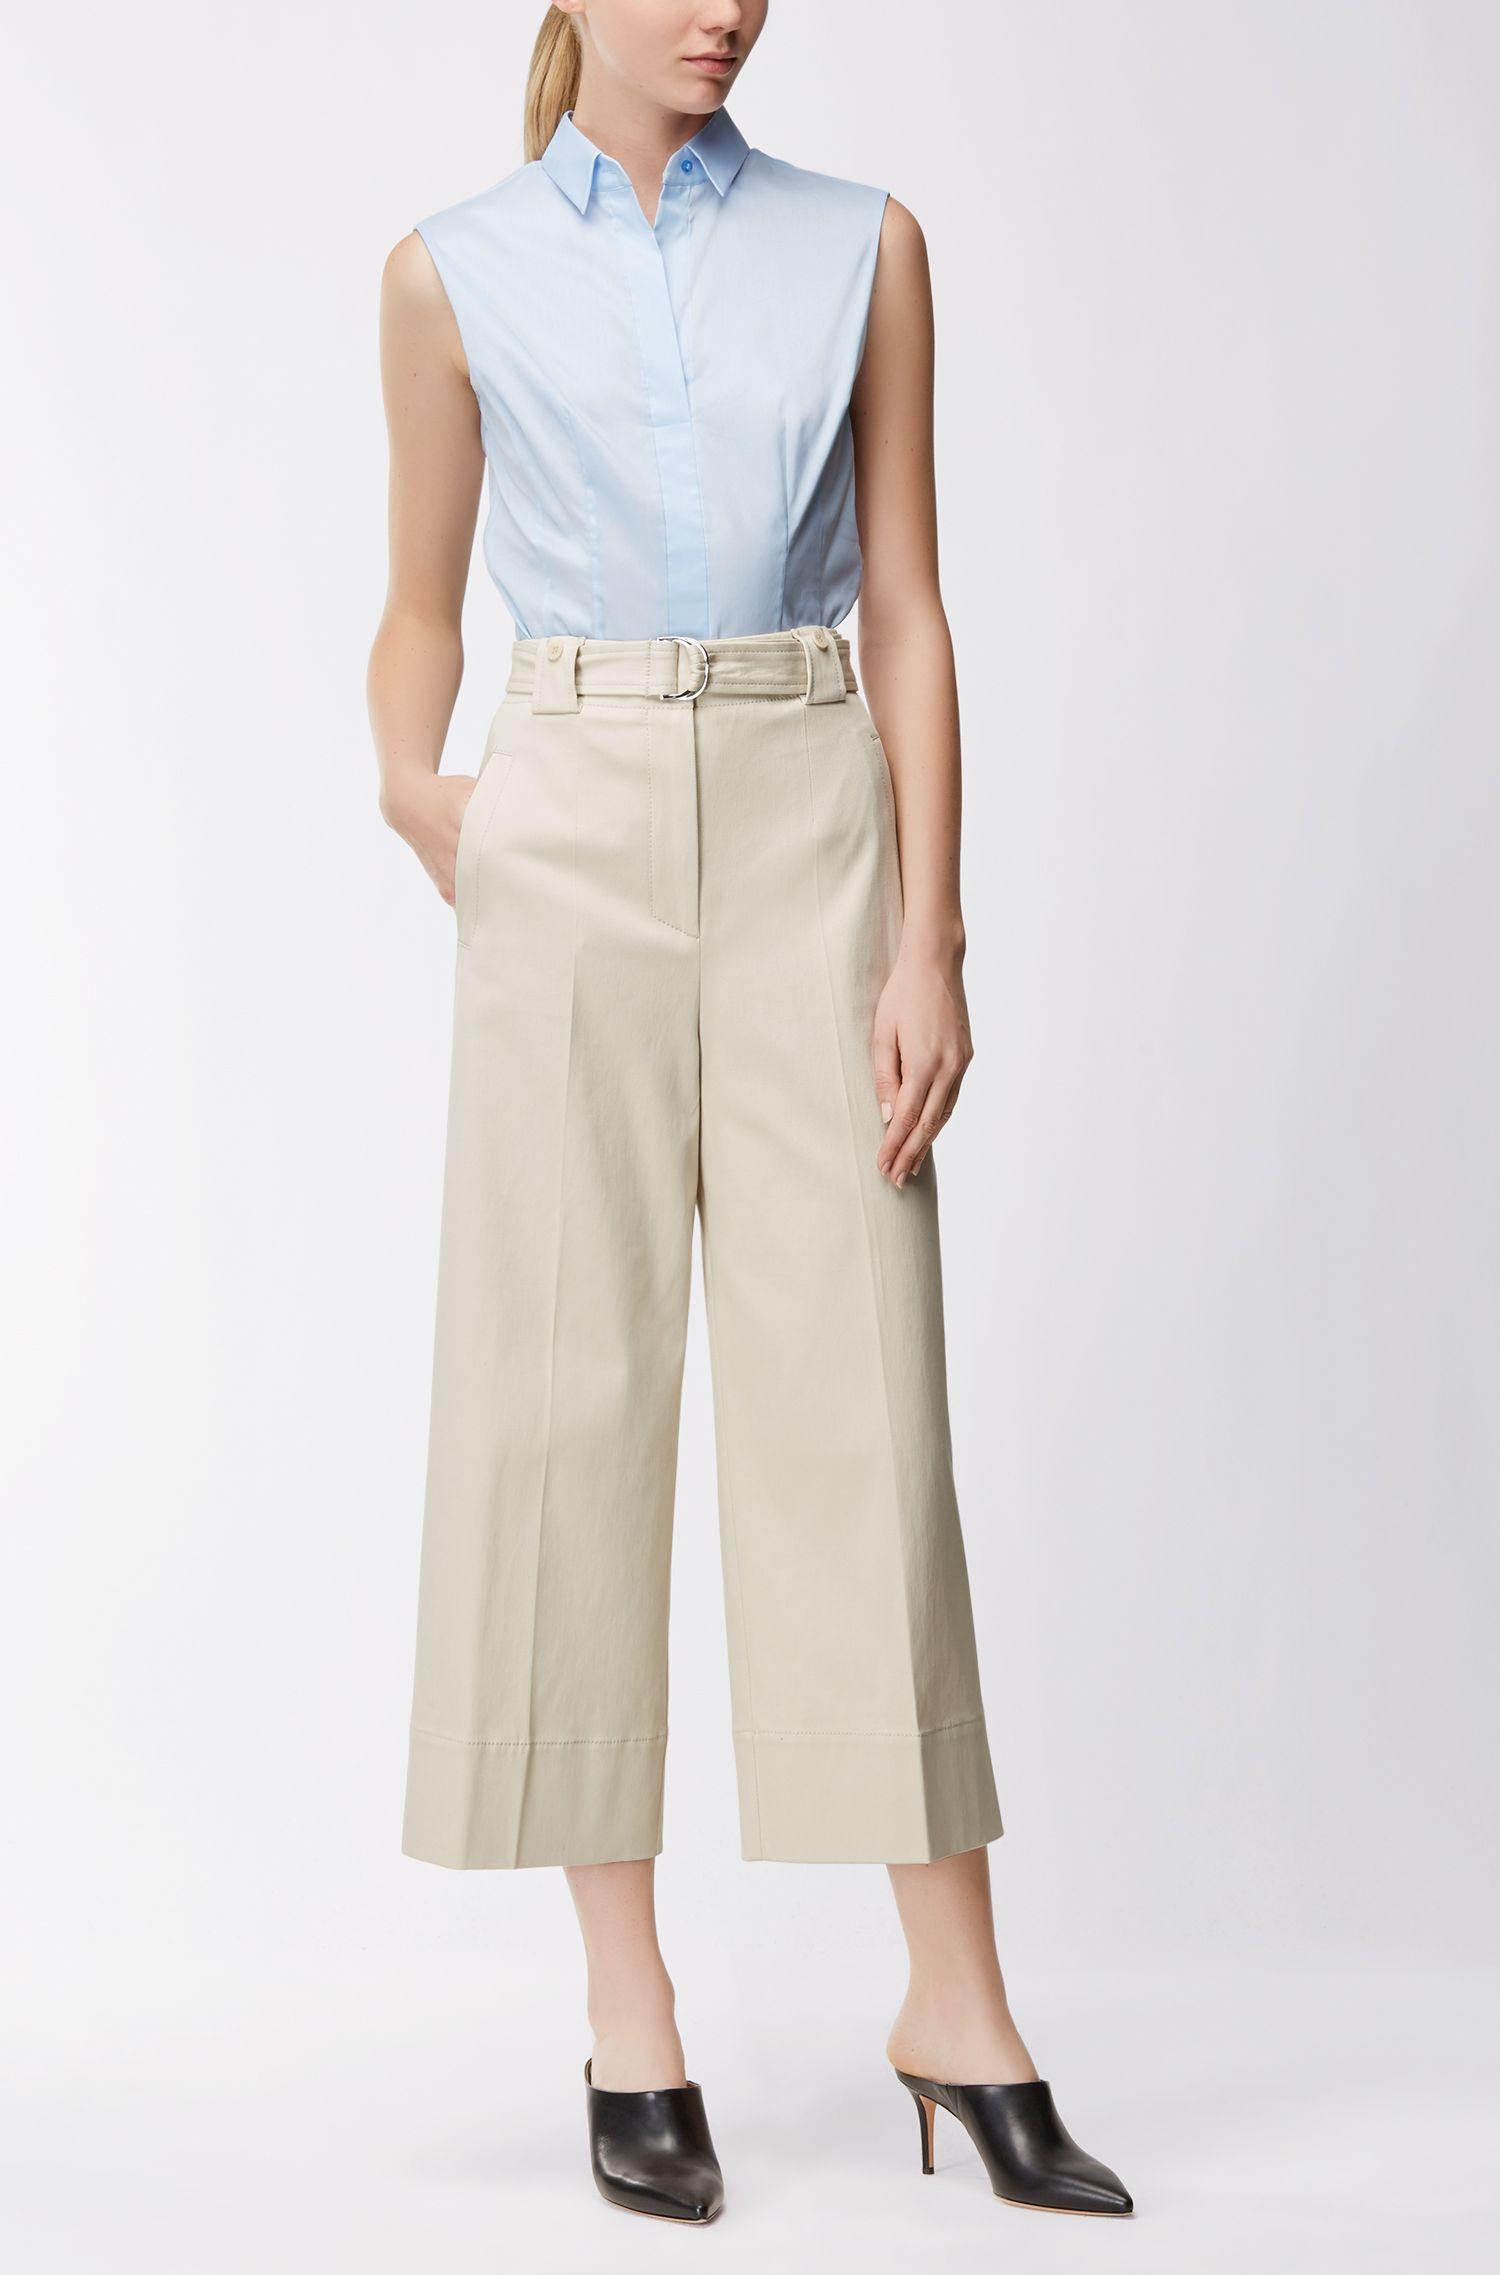 Blusa slim fit sin mangas en mezcla de algodón